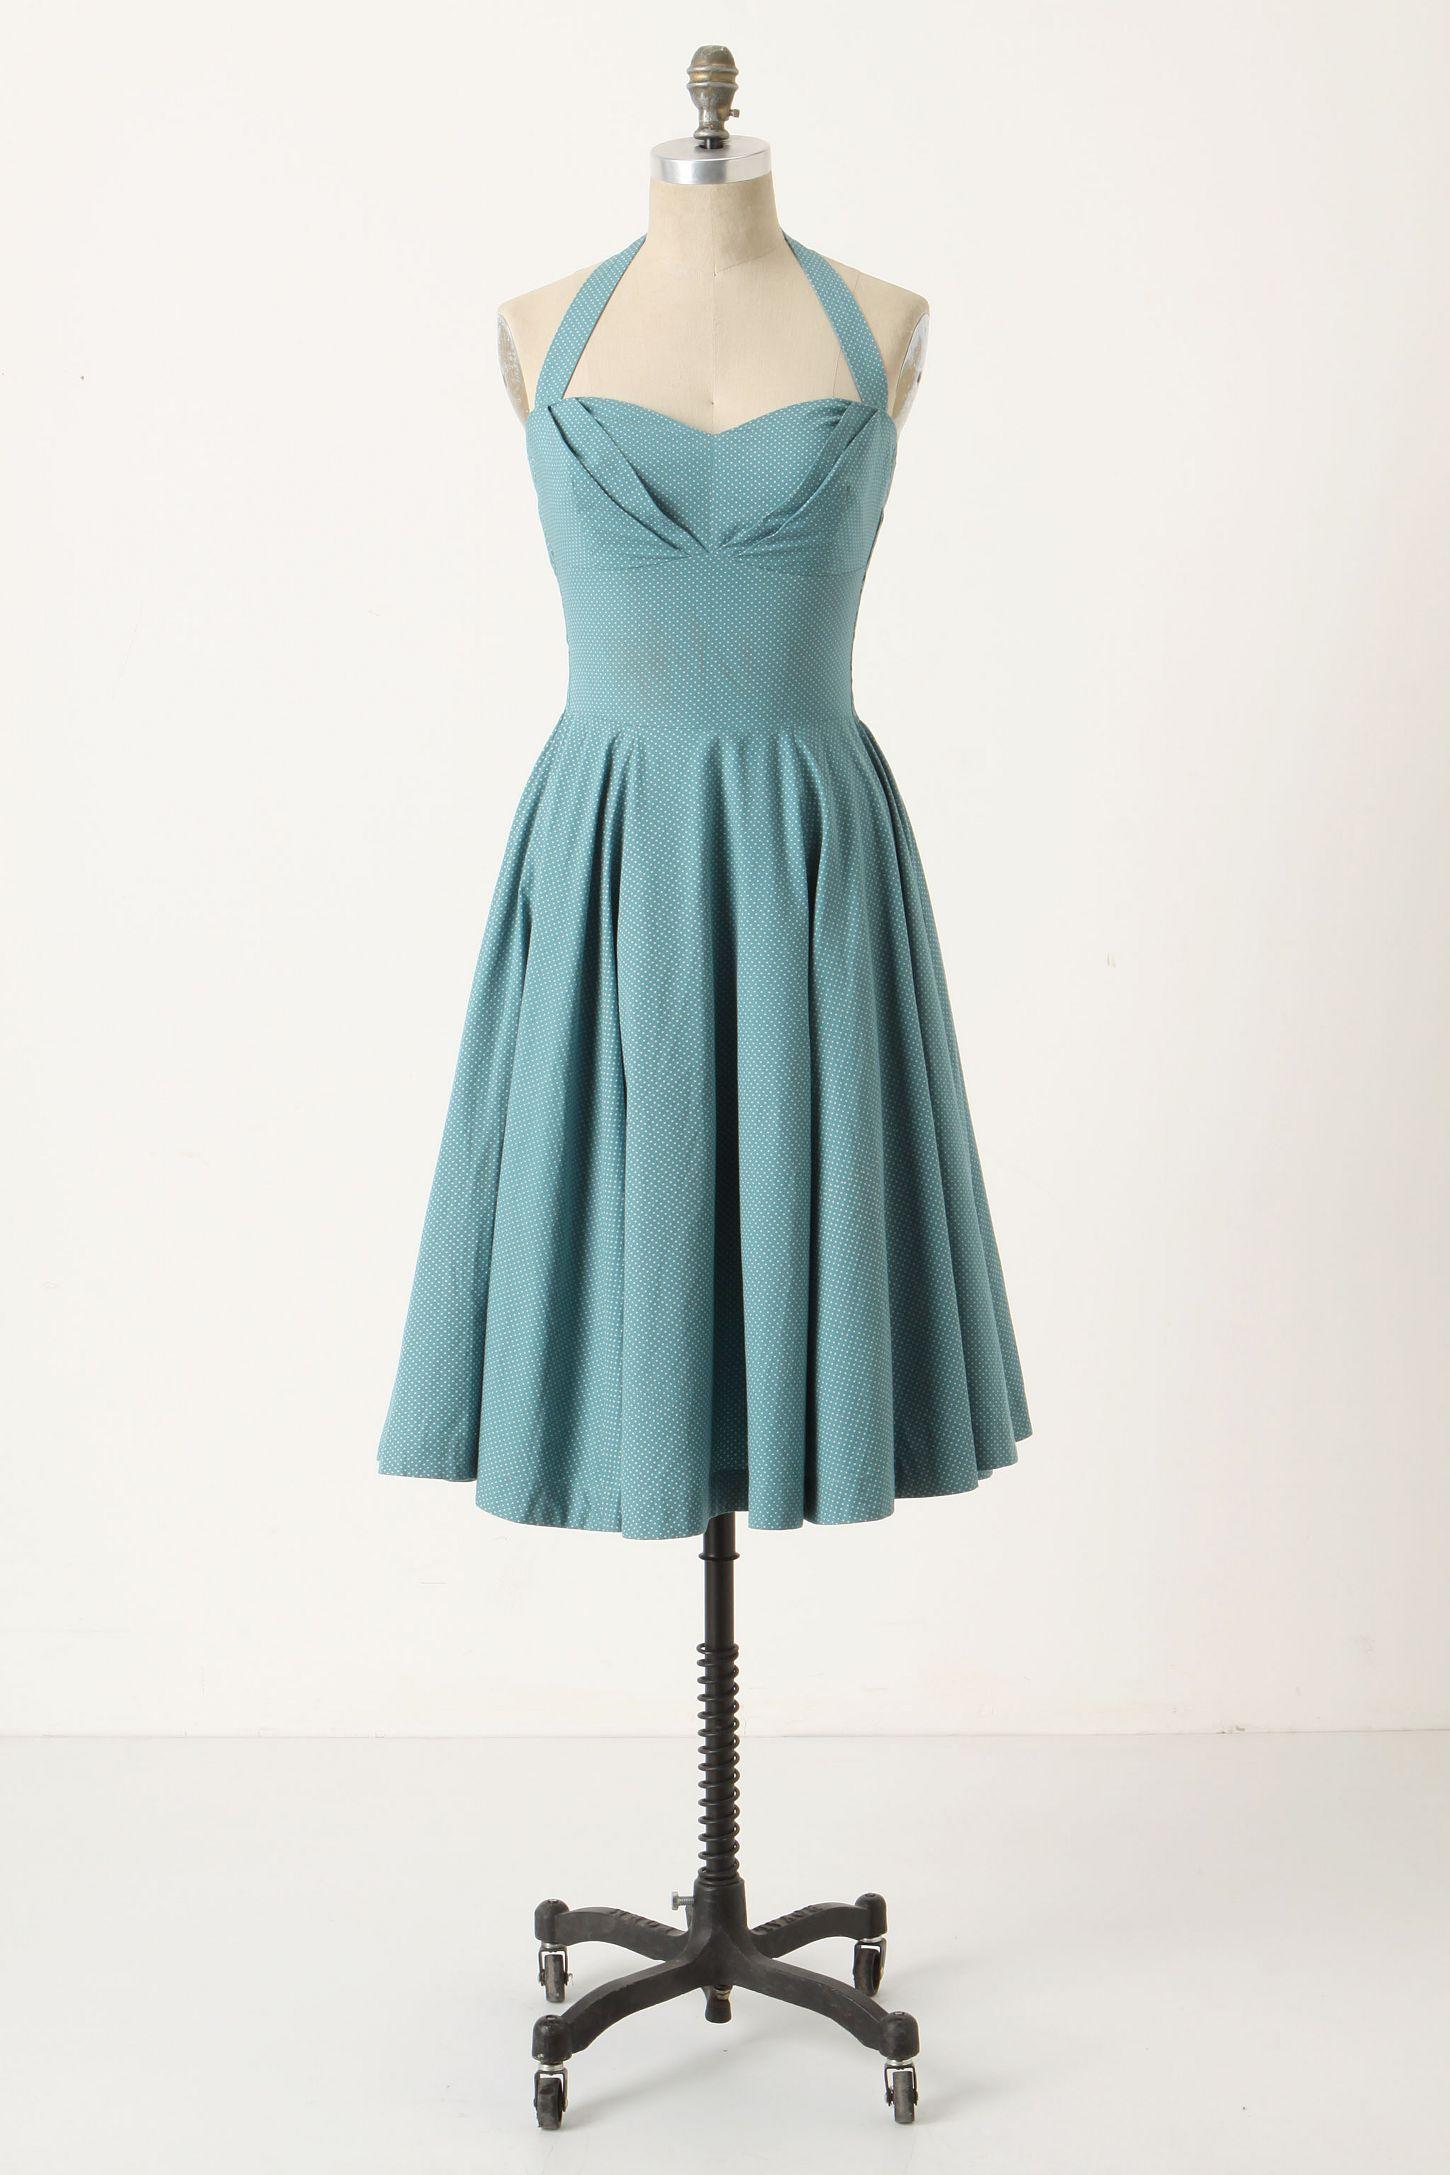 Traced Twirls Dress | Anthropologie